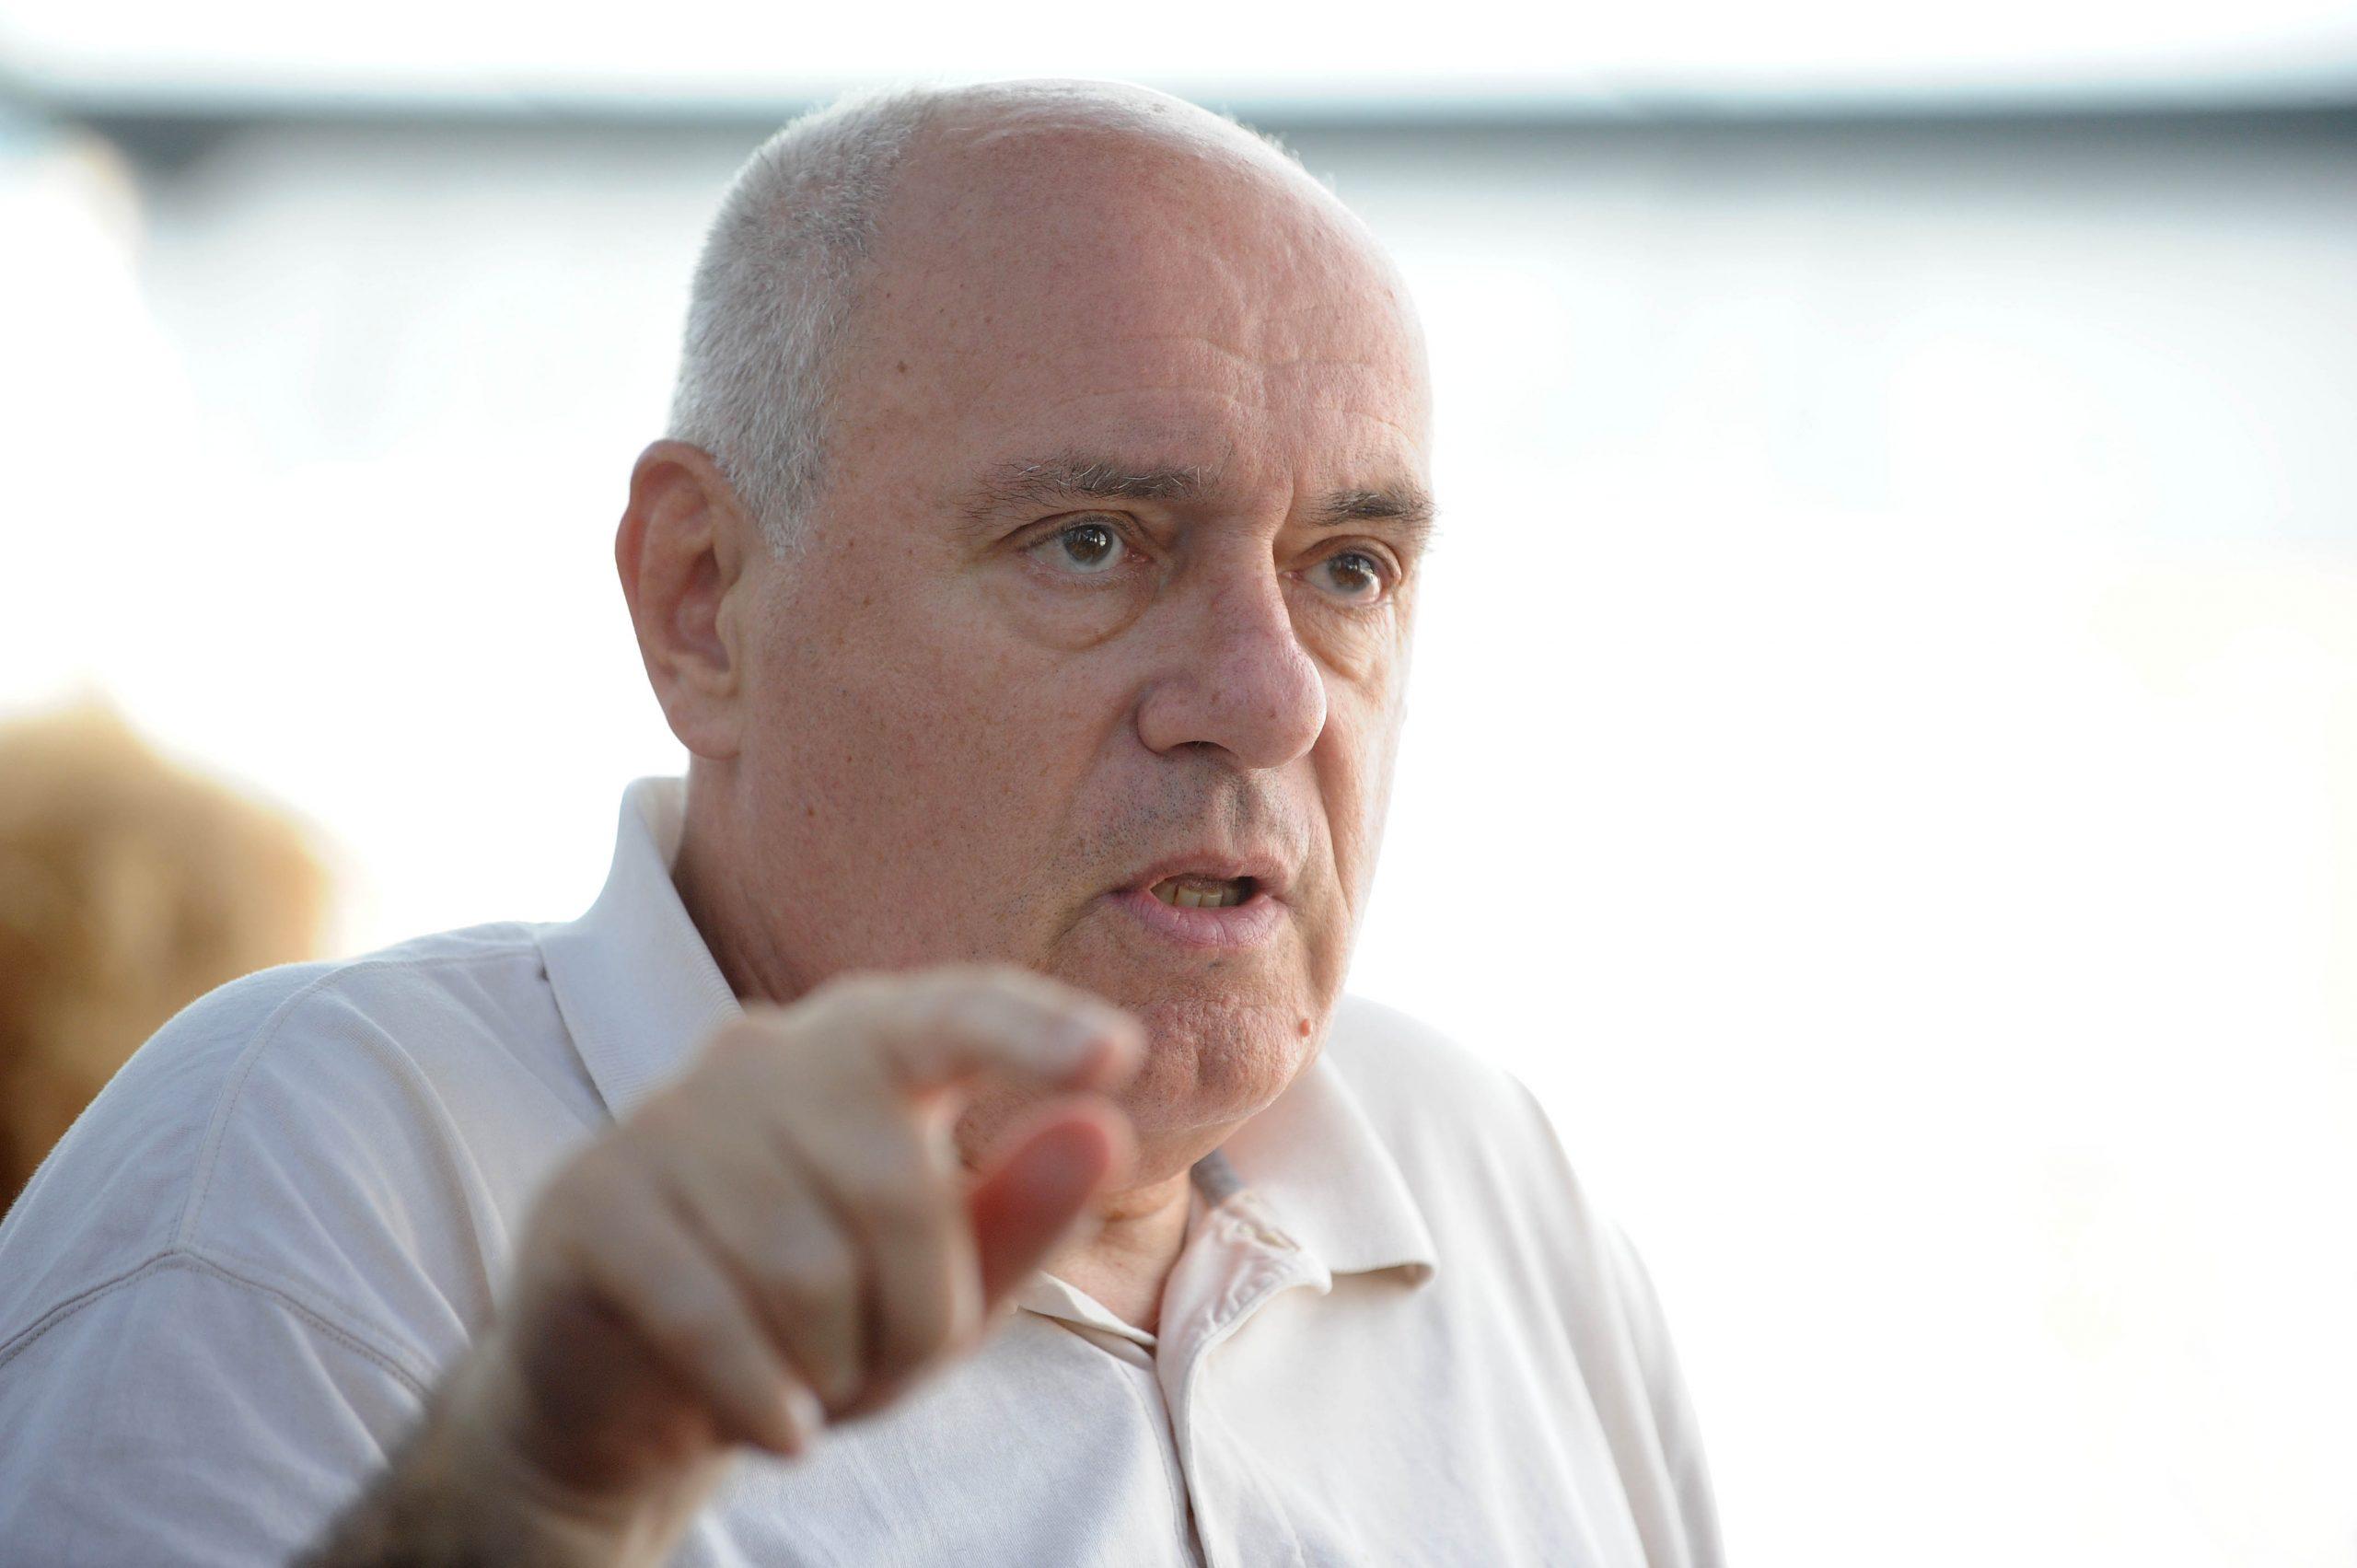 Milanović smatra da je njegova osoba, njegov karakter dovoljan program - Žarko Puhovski / Snimio Davor KOVAČEVIĆ